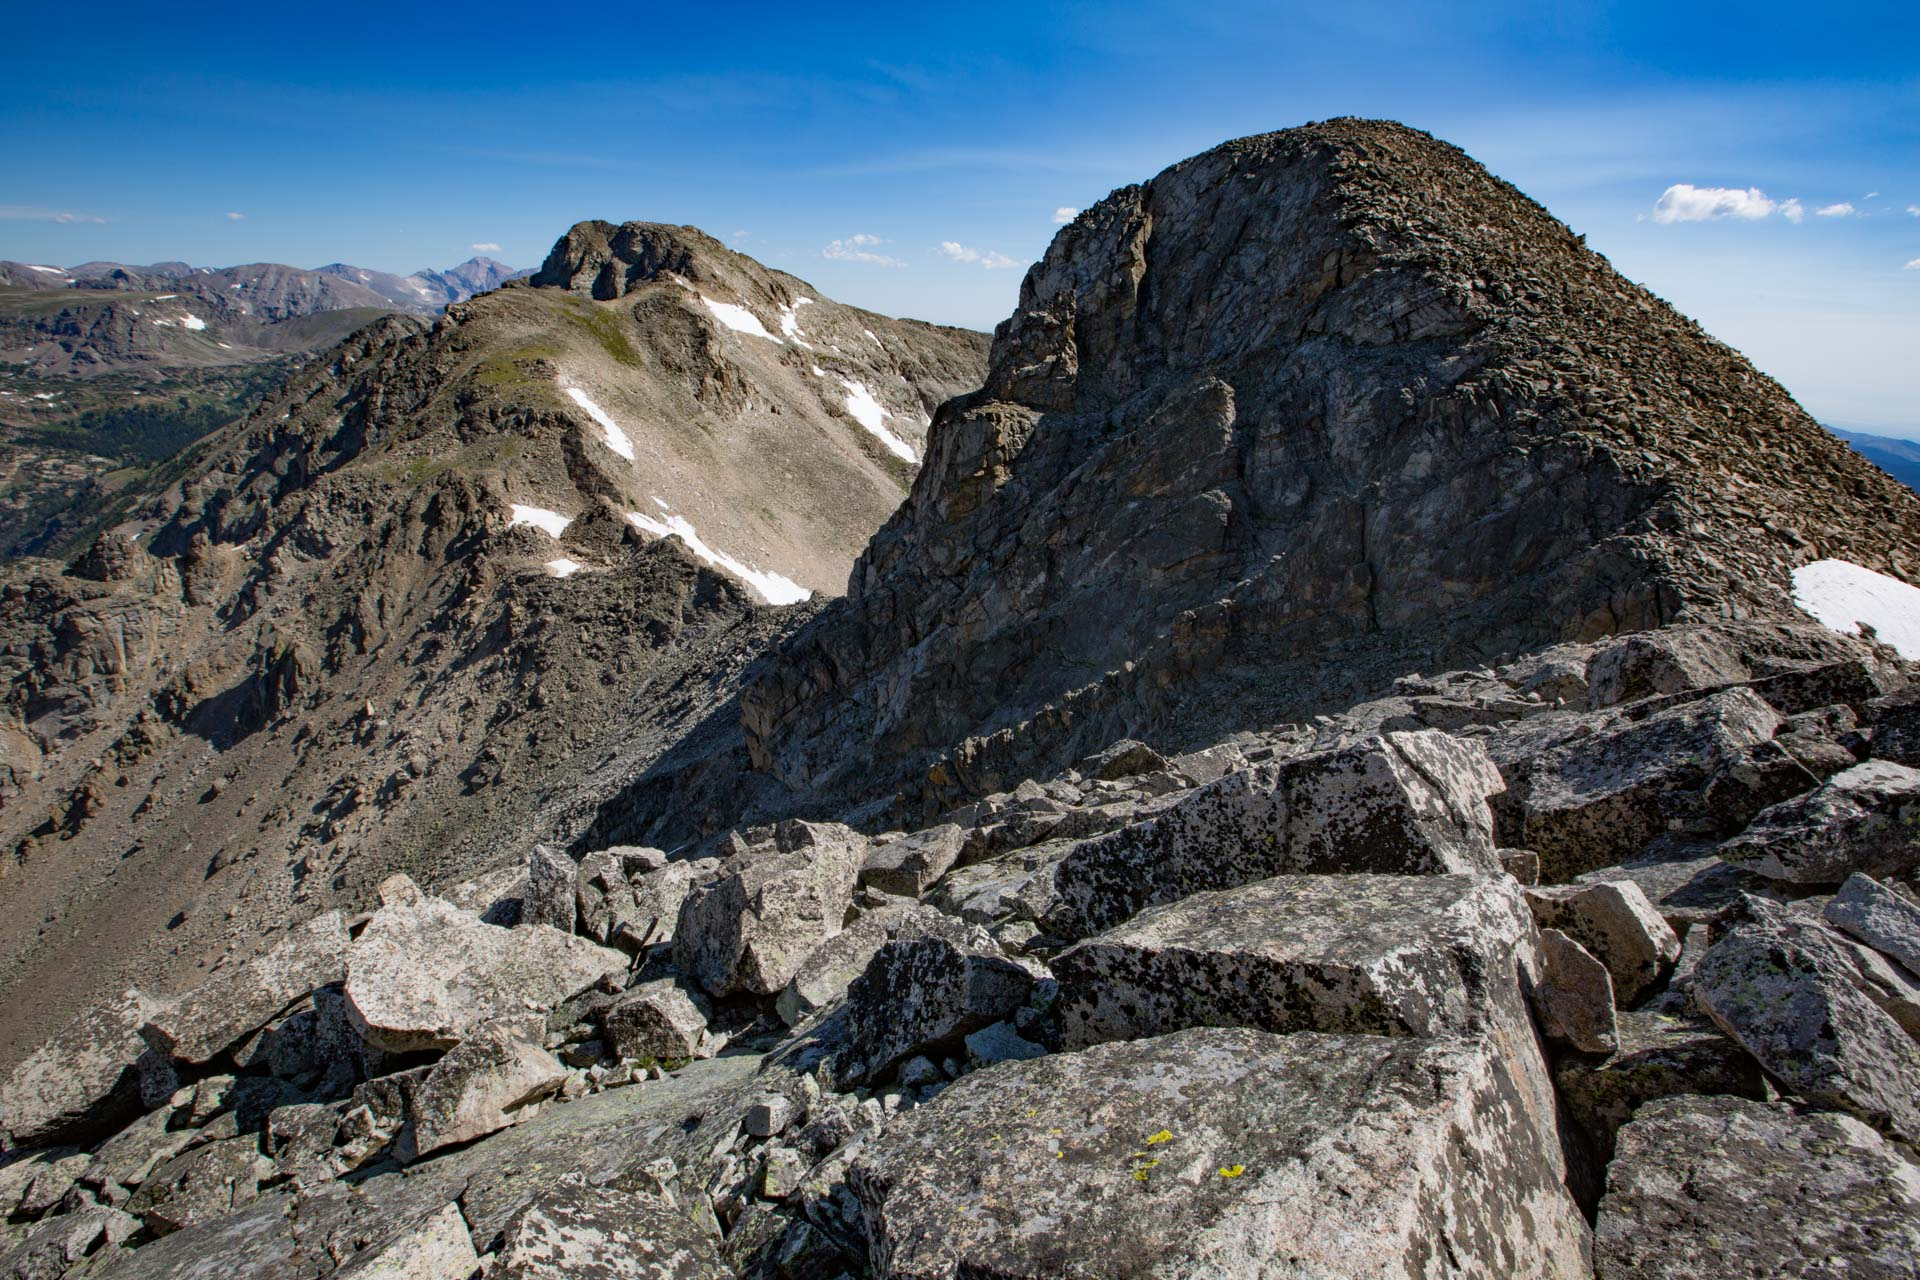 Paiute Peak and Mount Toll